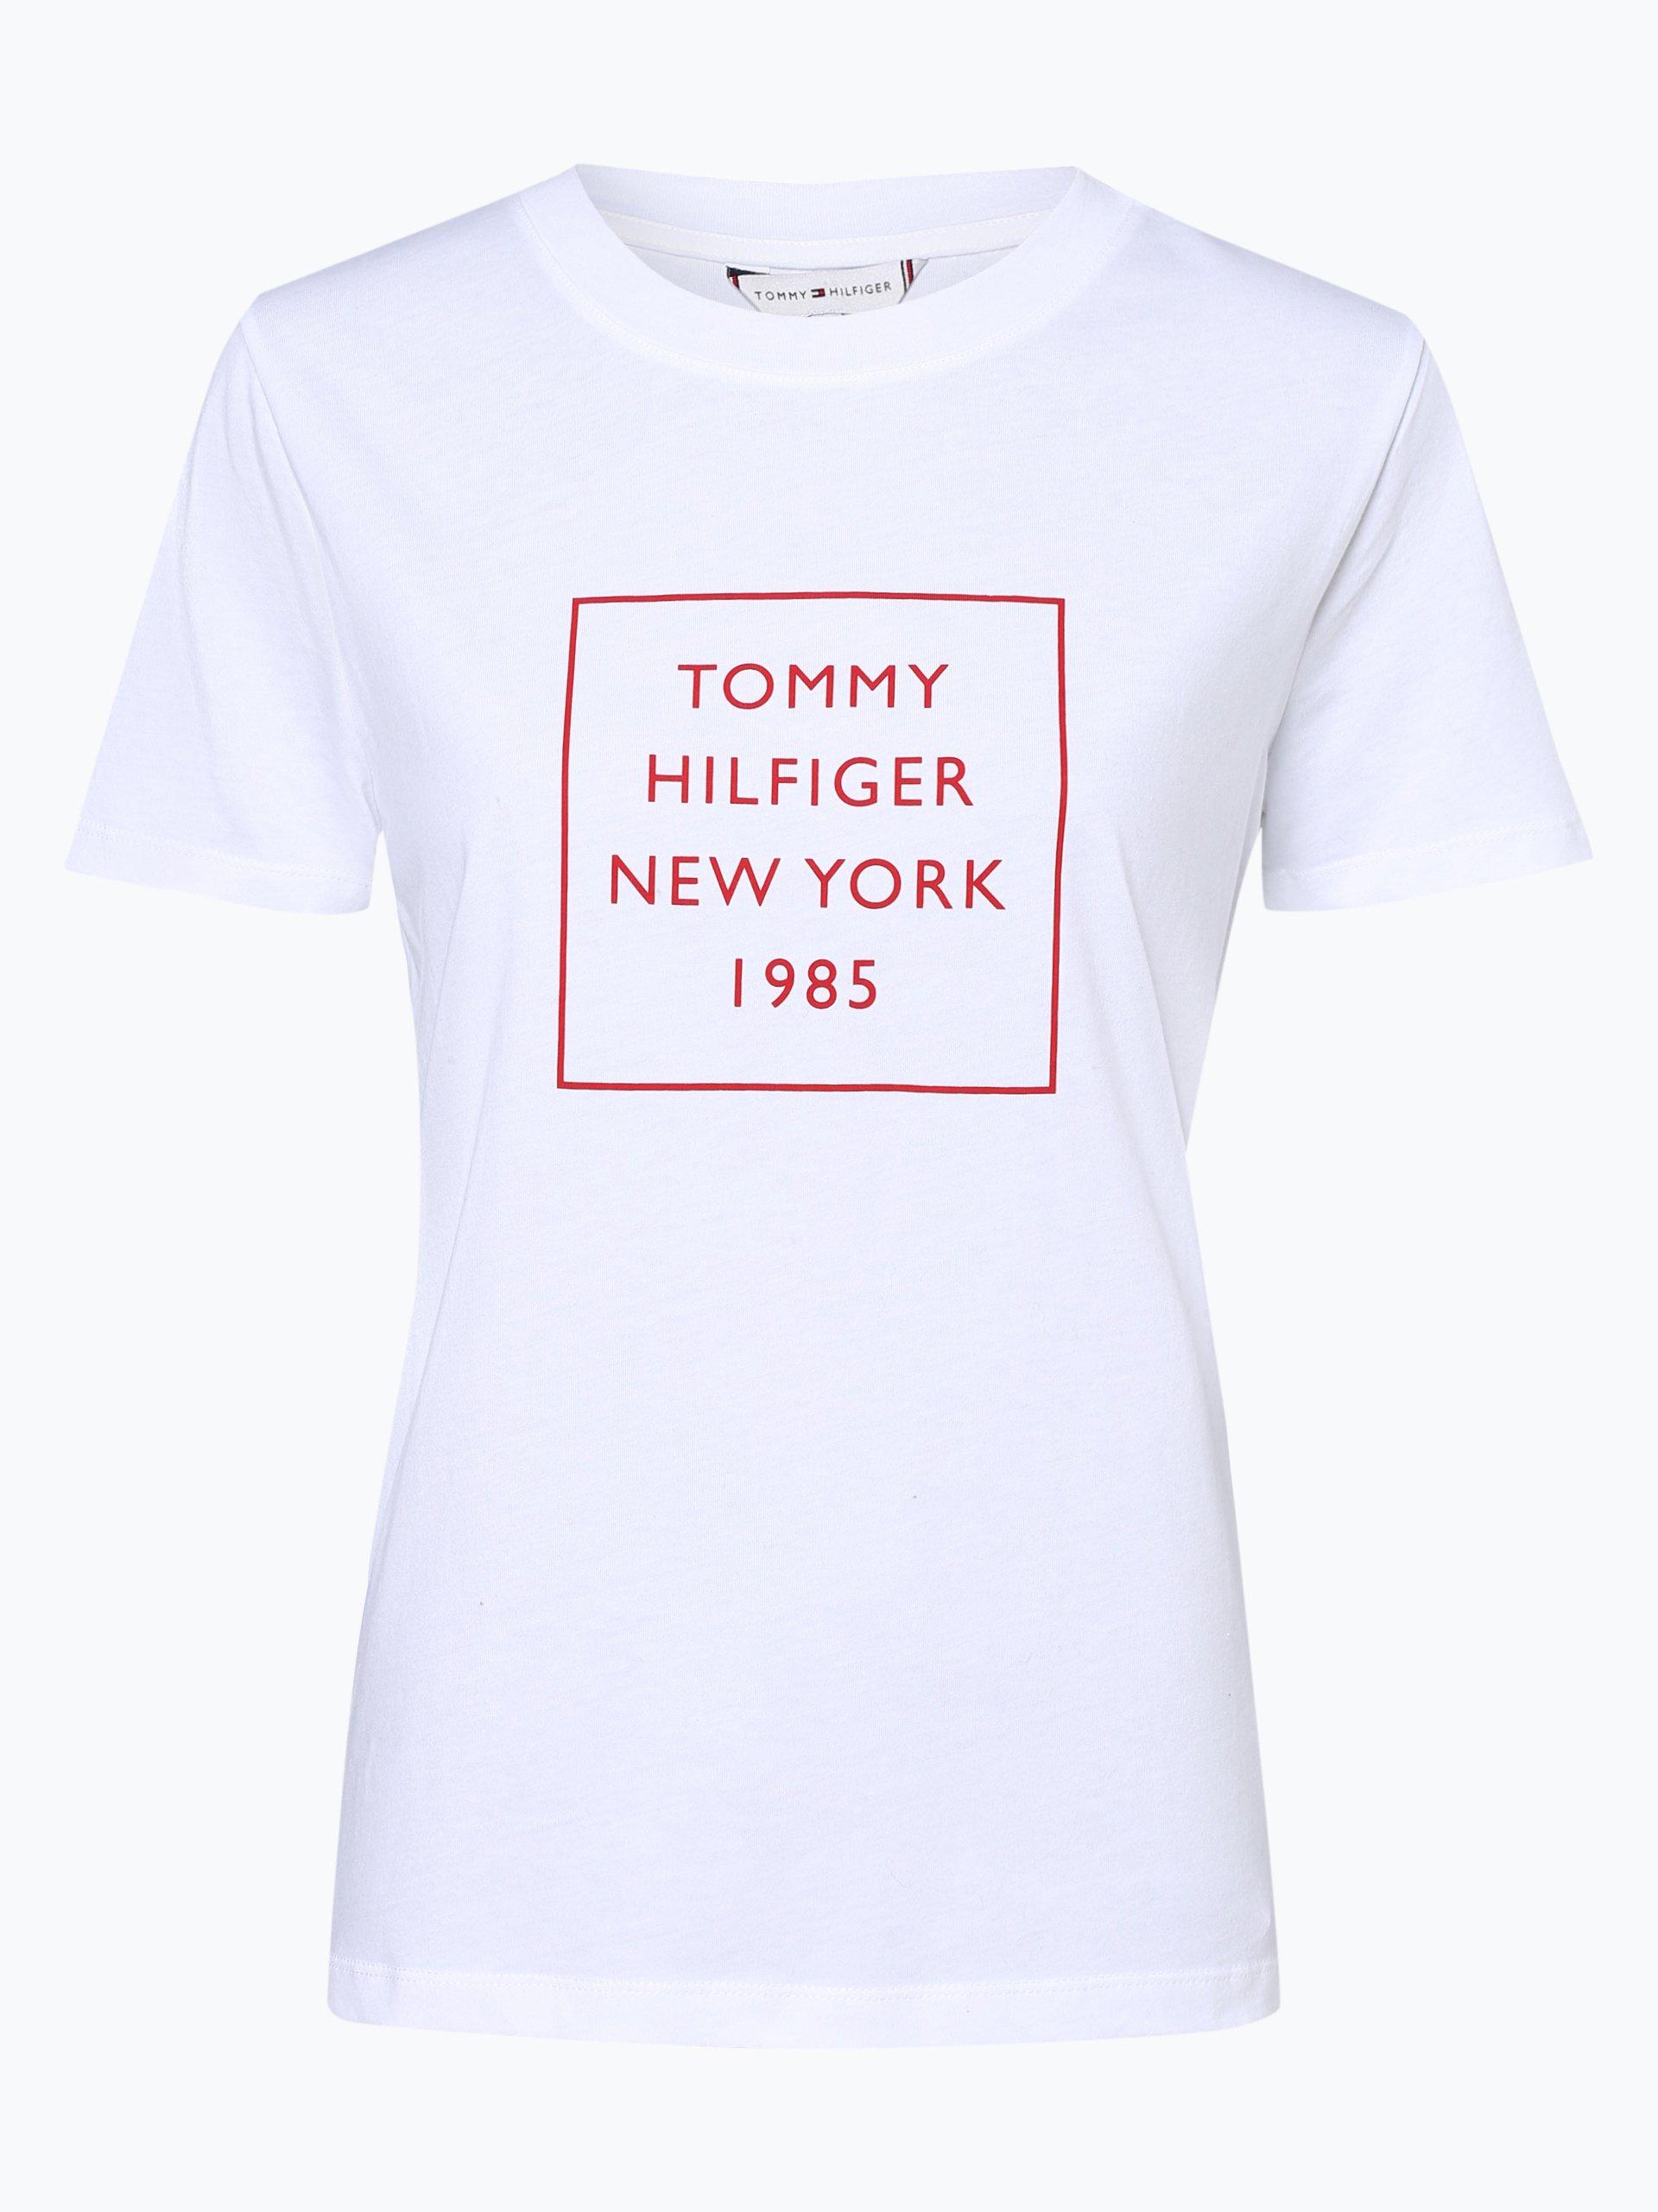 tommy hilfiger damen t shirt wei rot bedruckt online. Black Bedroom Furniture Sets. Home Design Ideas